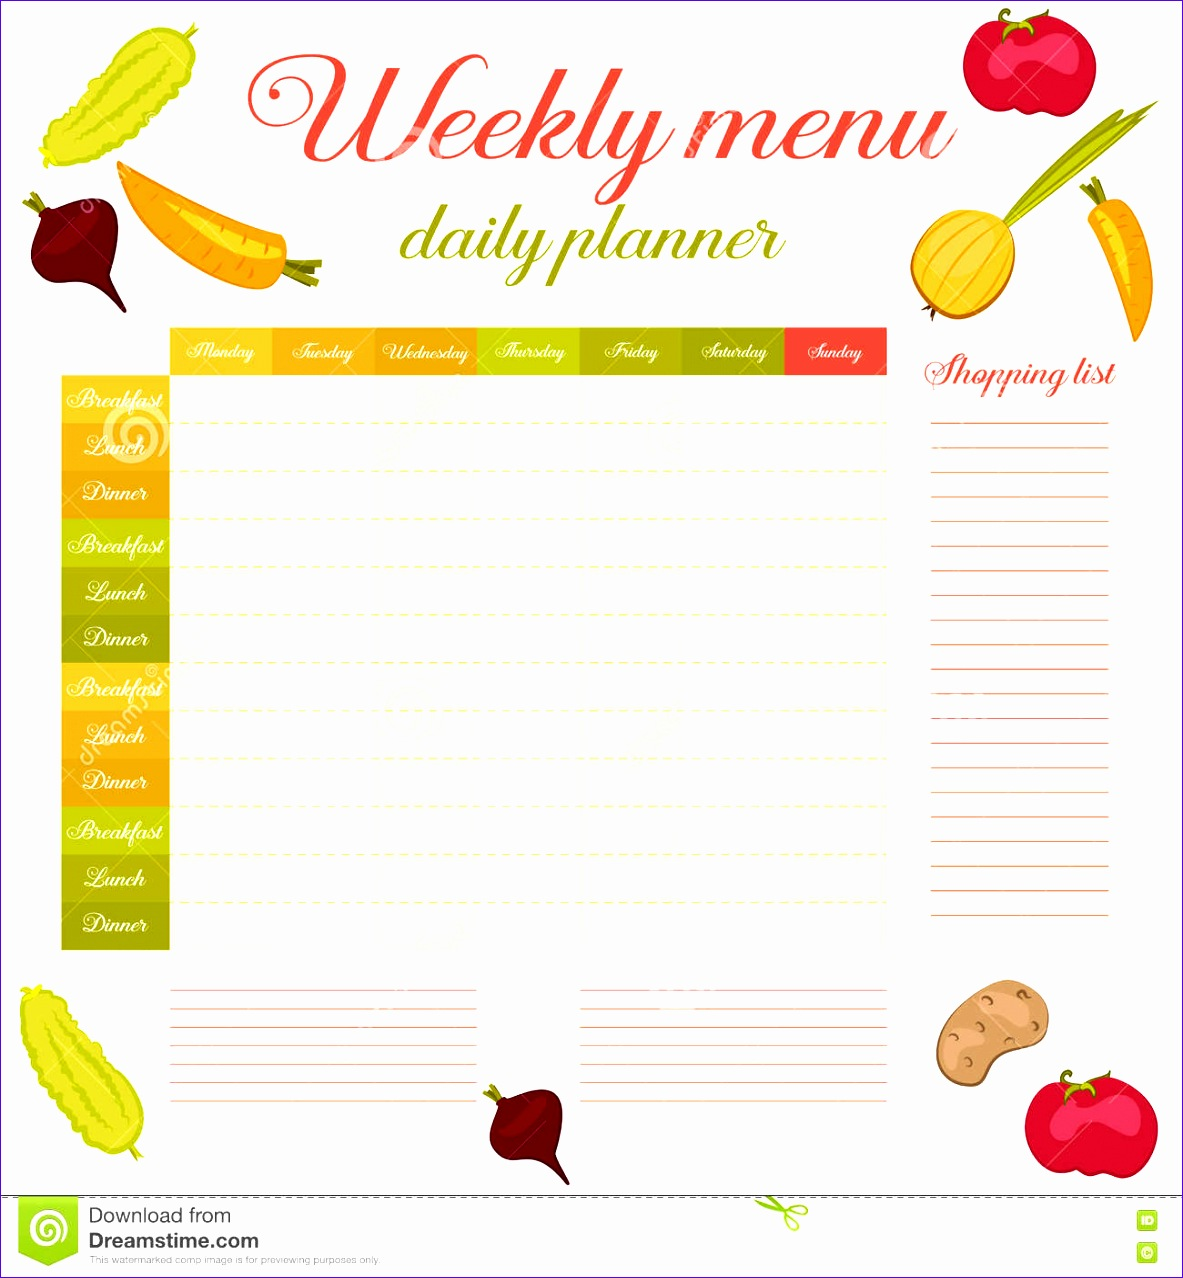 stock illustration weekly menu cute vintage planner paper note week healthy eating routine breakfast lunch dinner calendar template shopping image 11831278